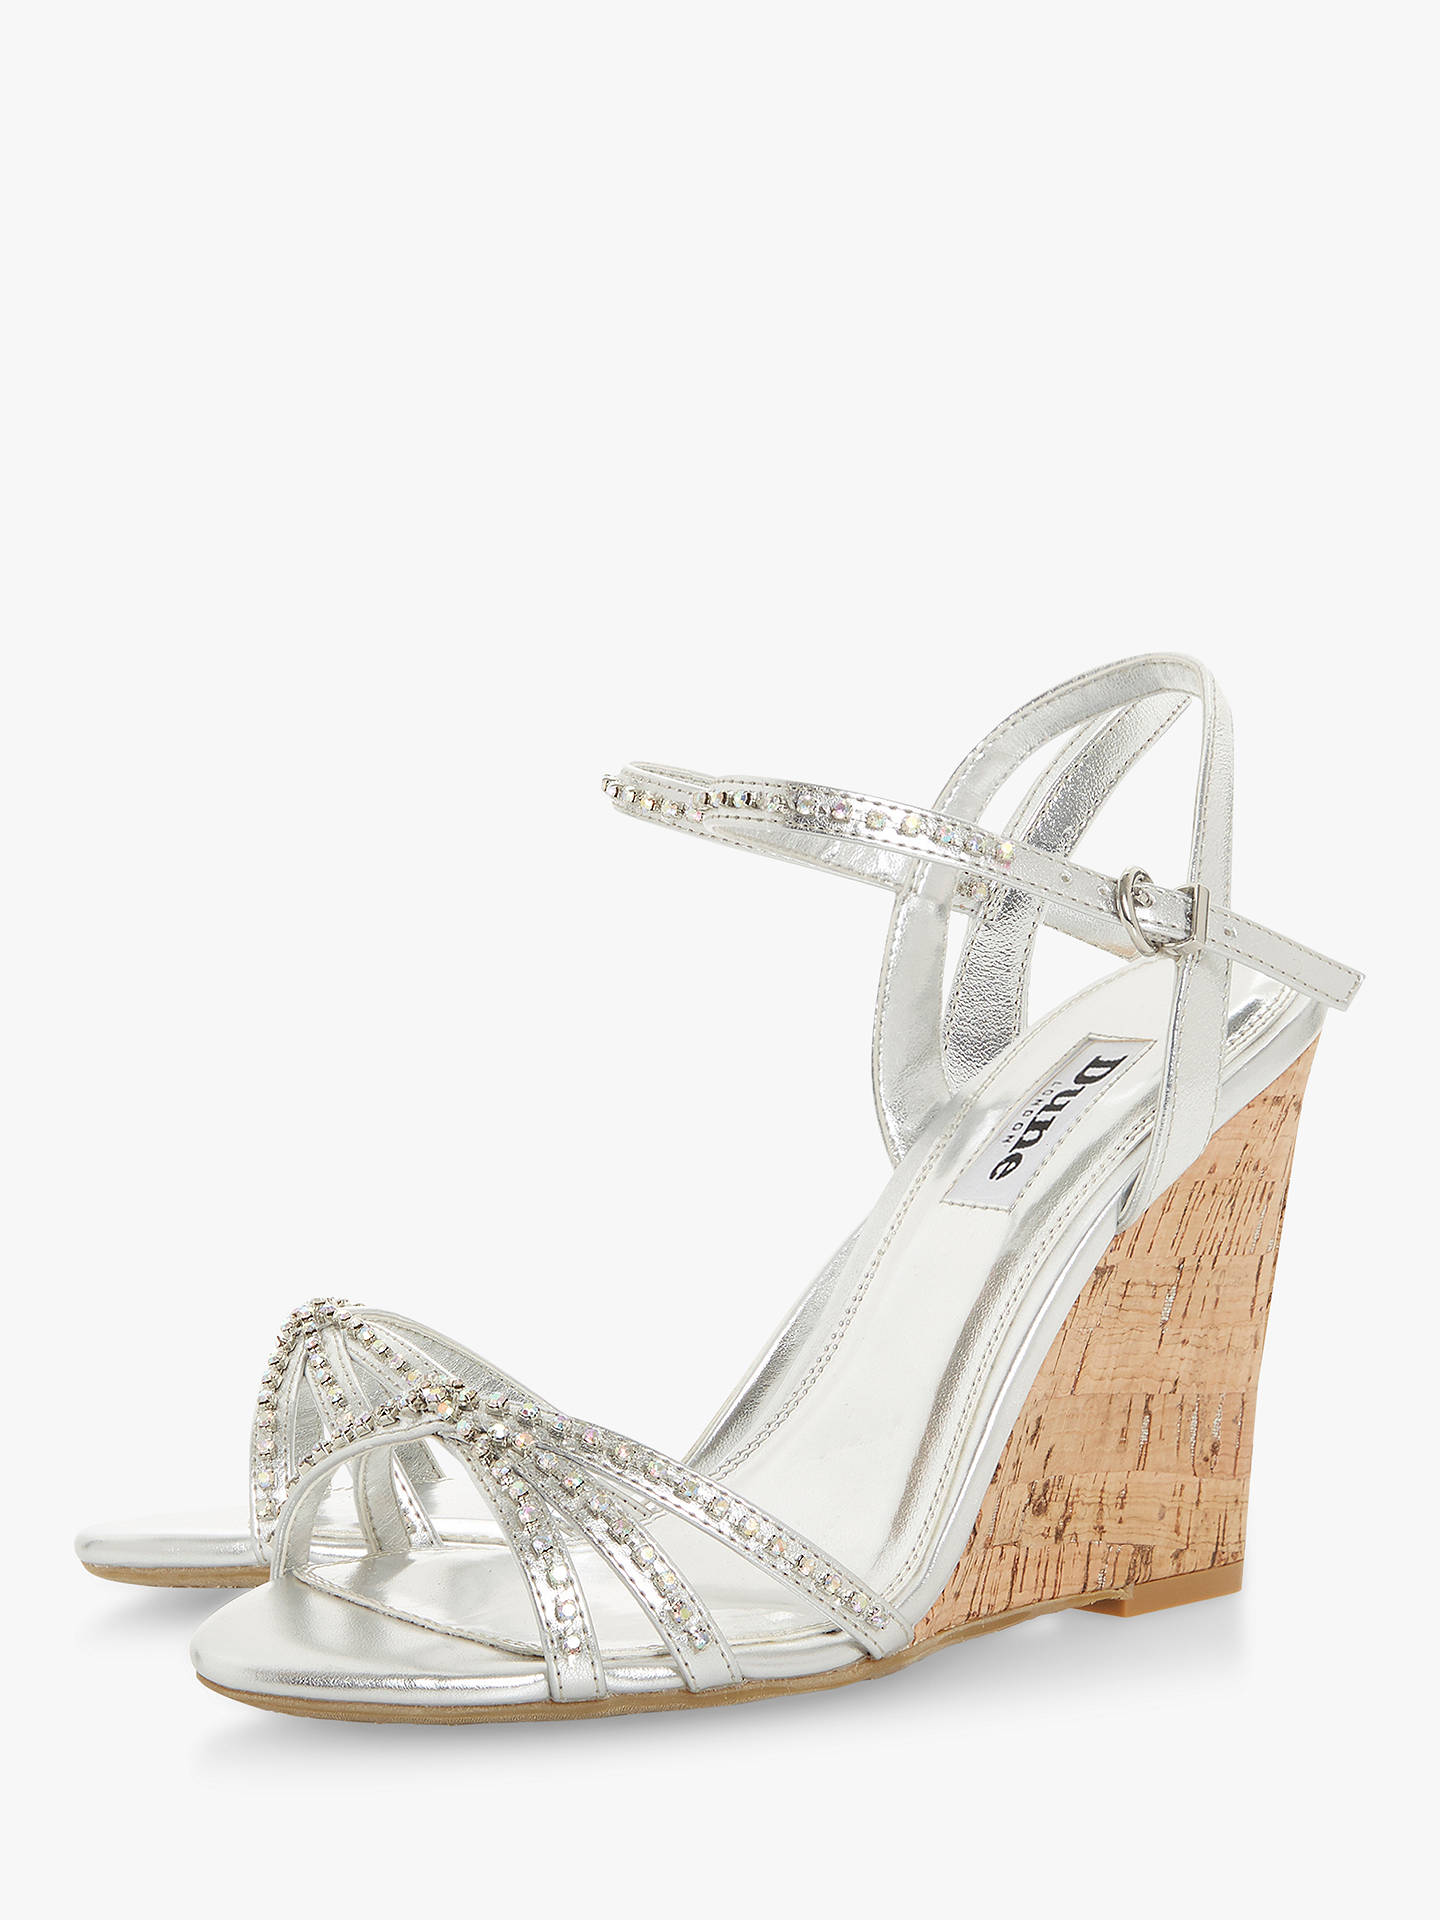 c9fbb01ecea5 Dune Minke Wedge Heel Diamante Sandals at John Lewis   Partners